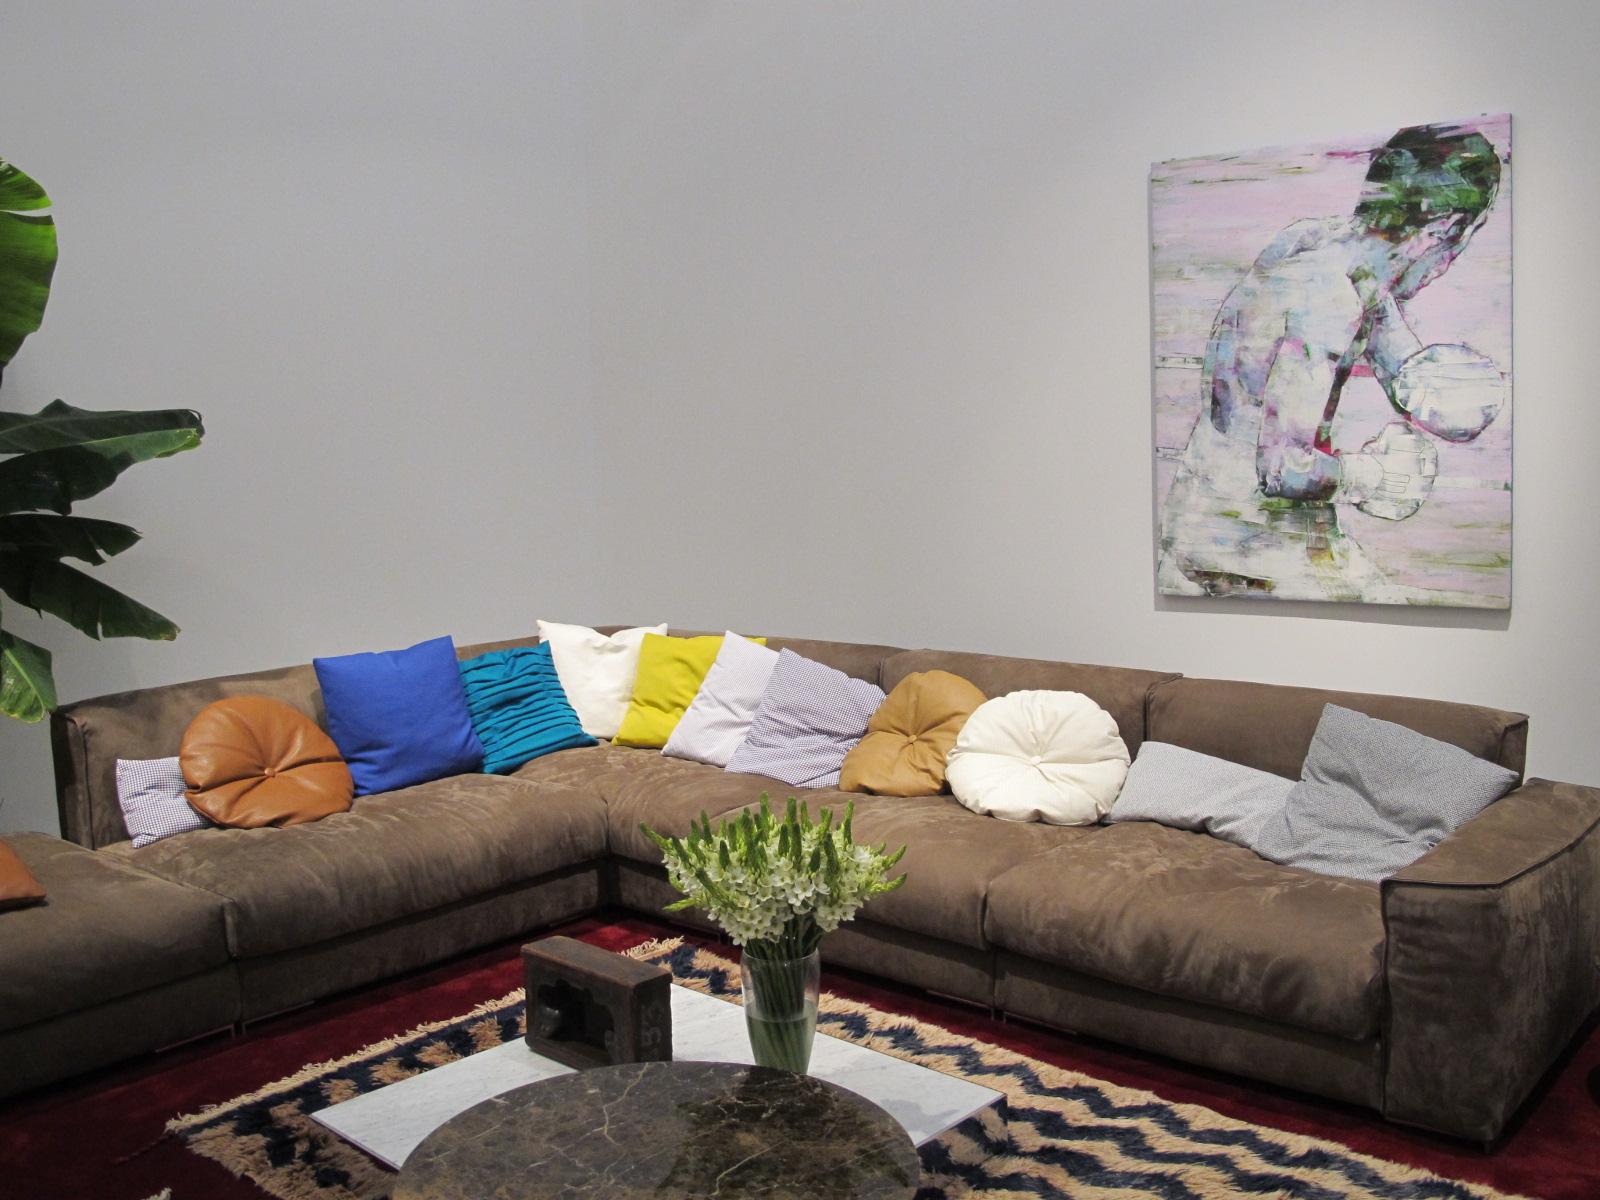 Salon du meuble de Milan 2011, fiera di Rho